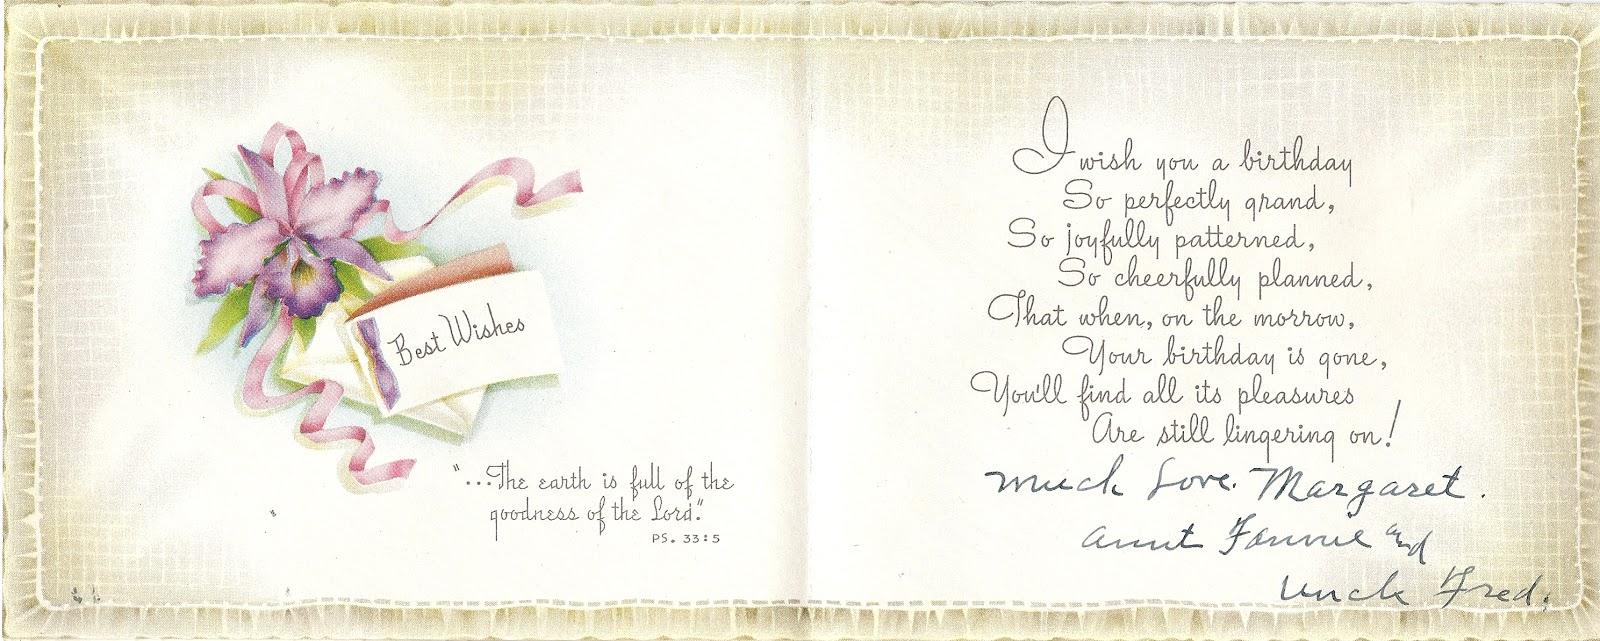 Fred And Fanny Gantenbeins Card